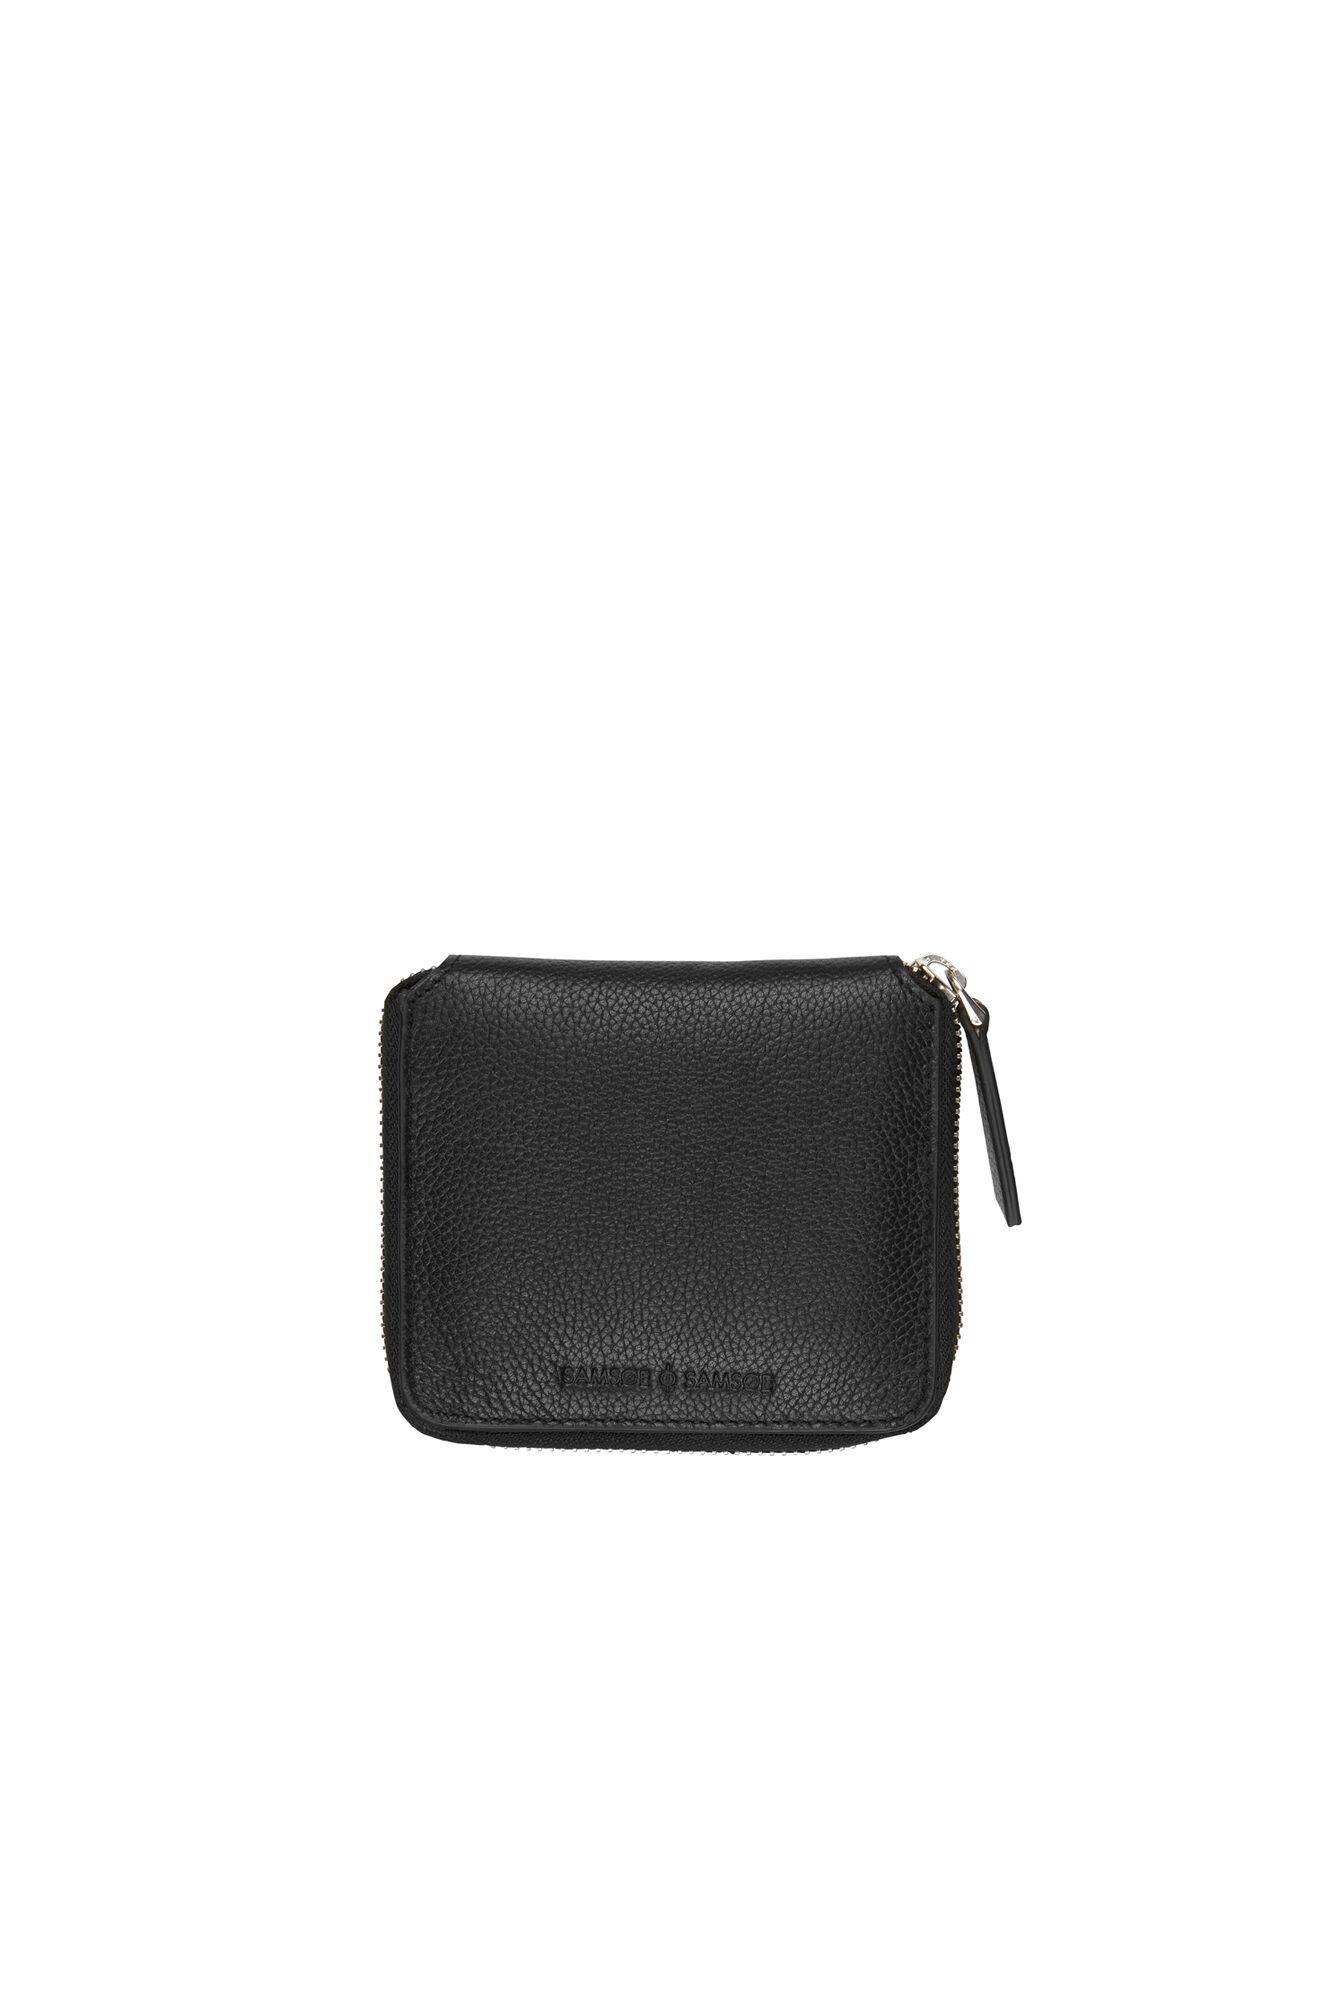 Mugg wallet w 3338, BLACK